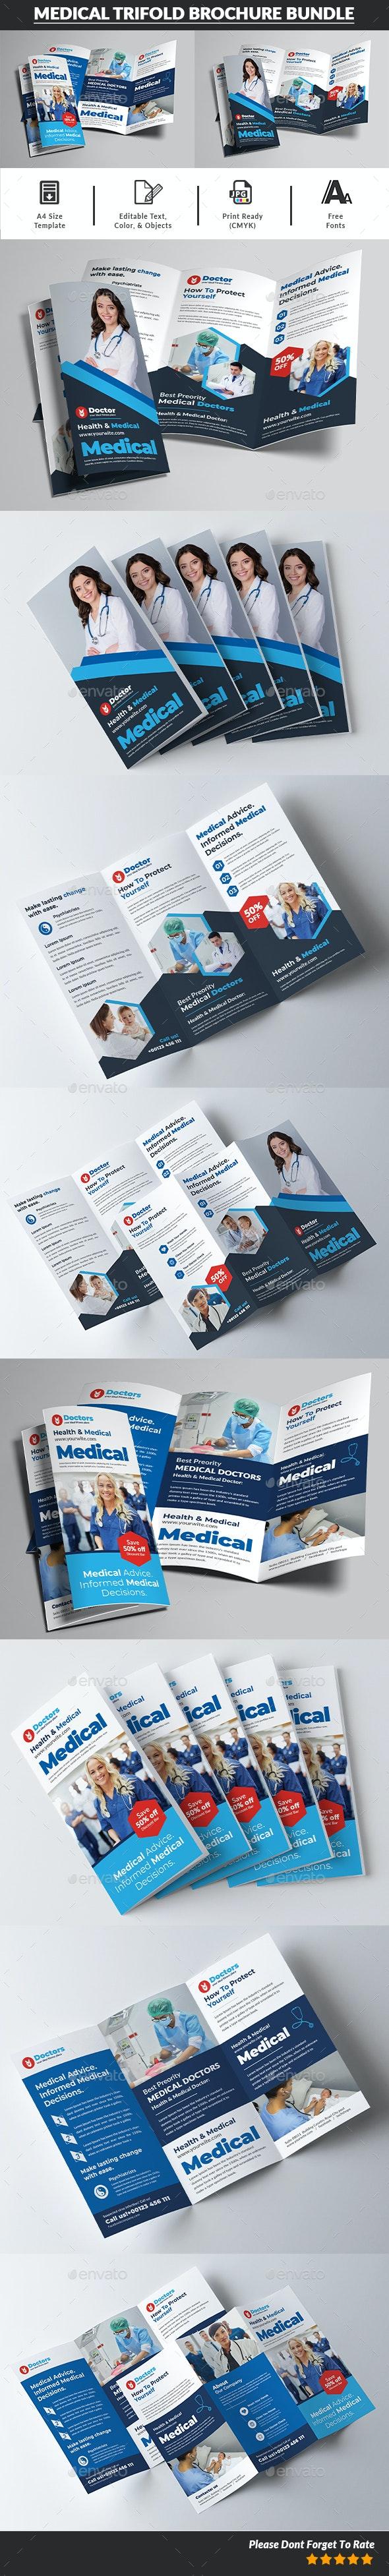 Medical Trifold Brochure Bundle - Corporate Brochures